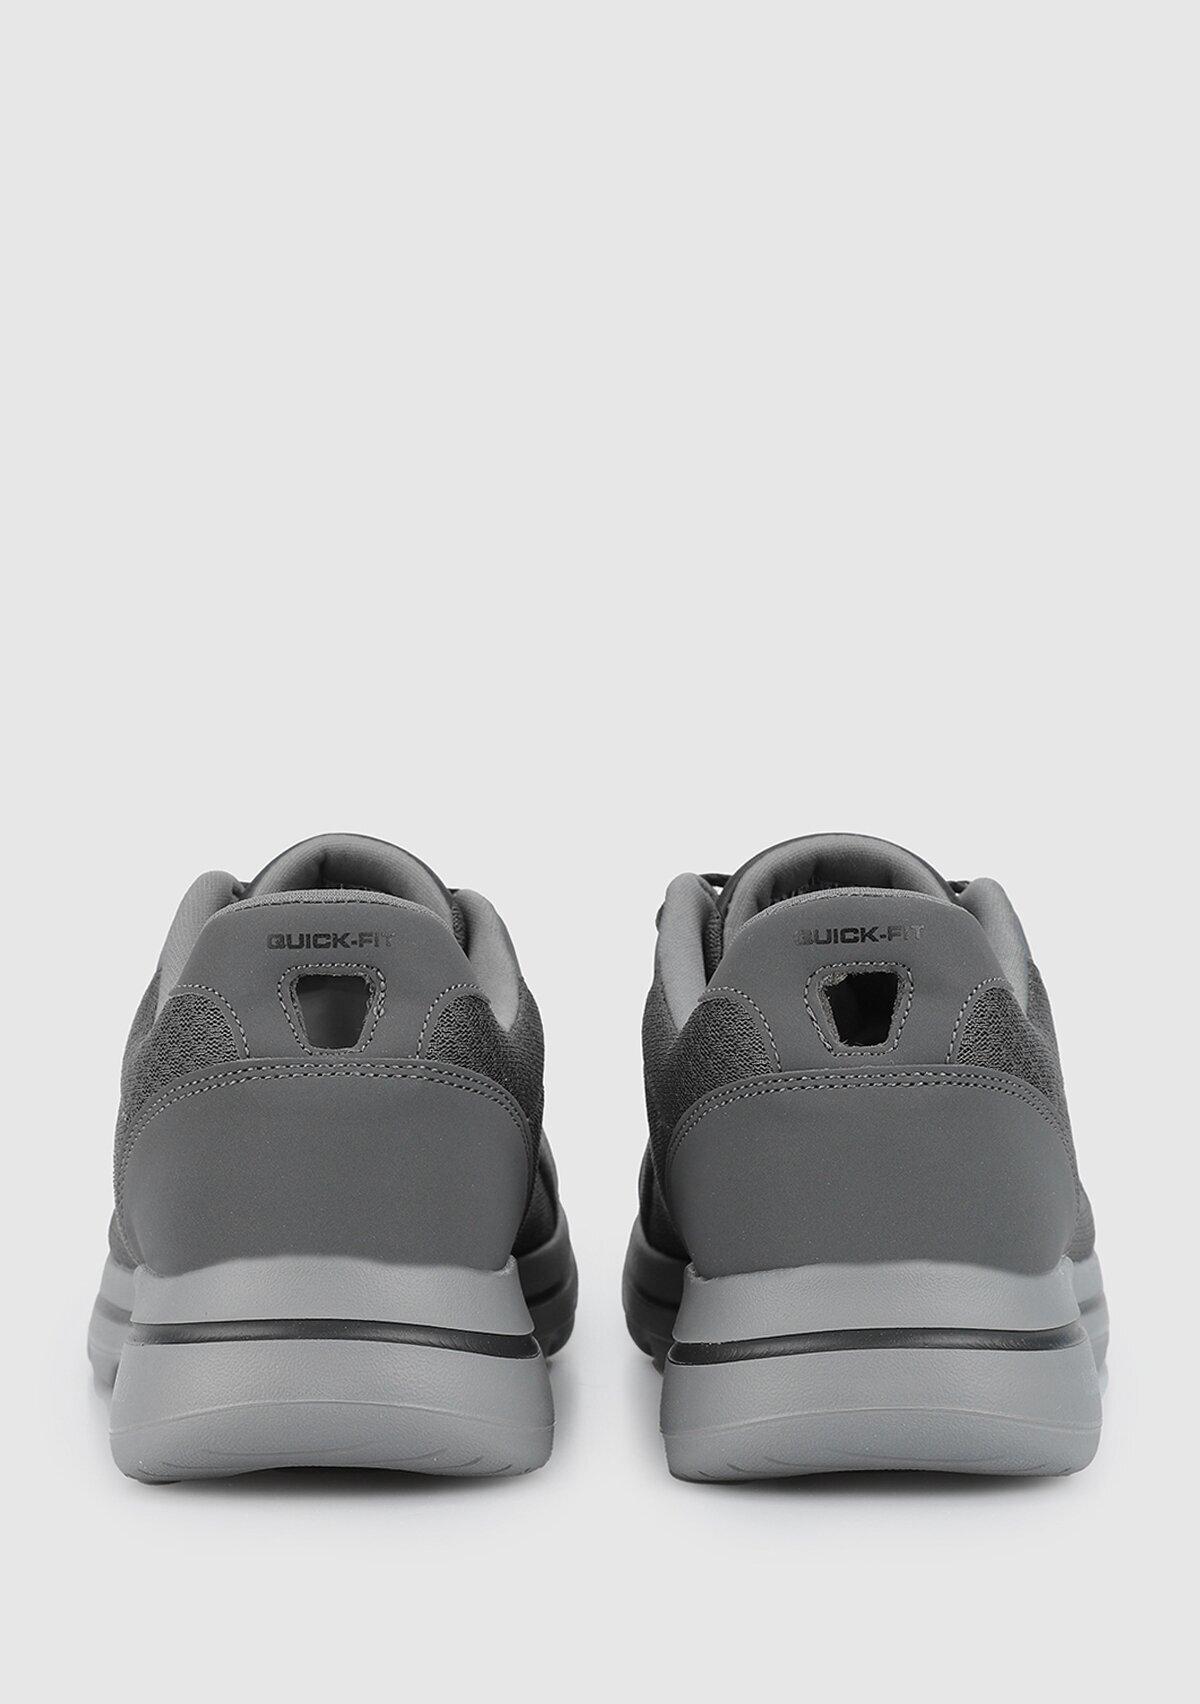 resm Go Walks 5 Gri Erkek Sneaker 55509 Ccbk